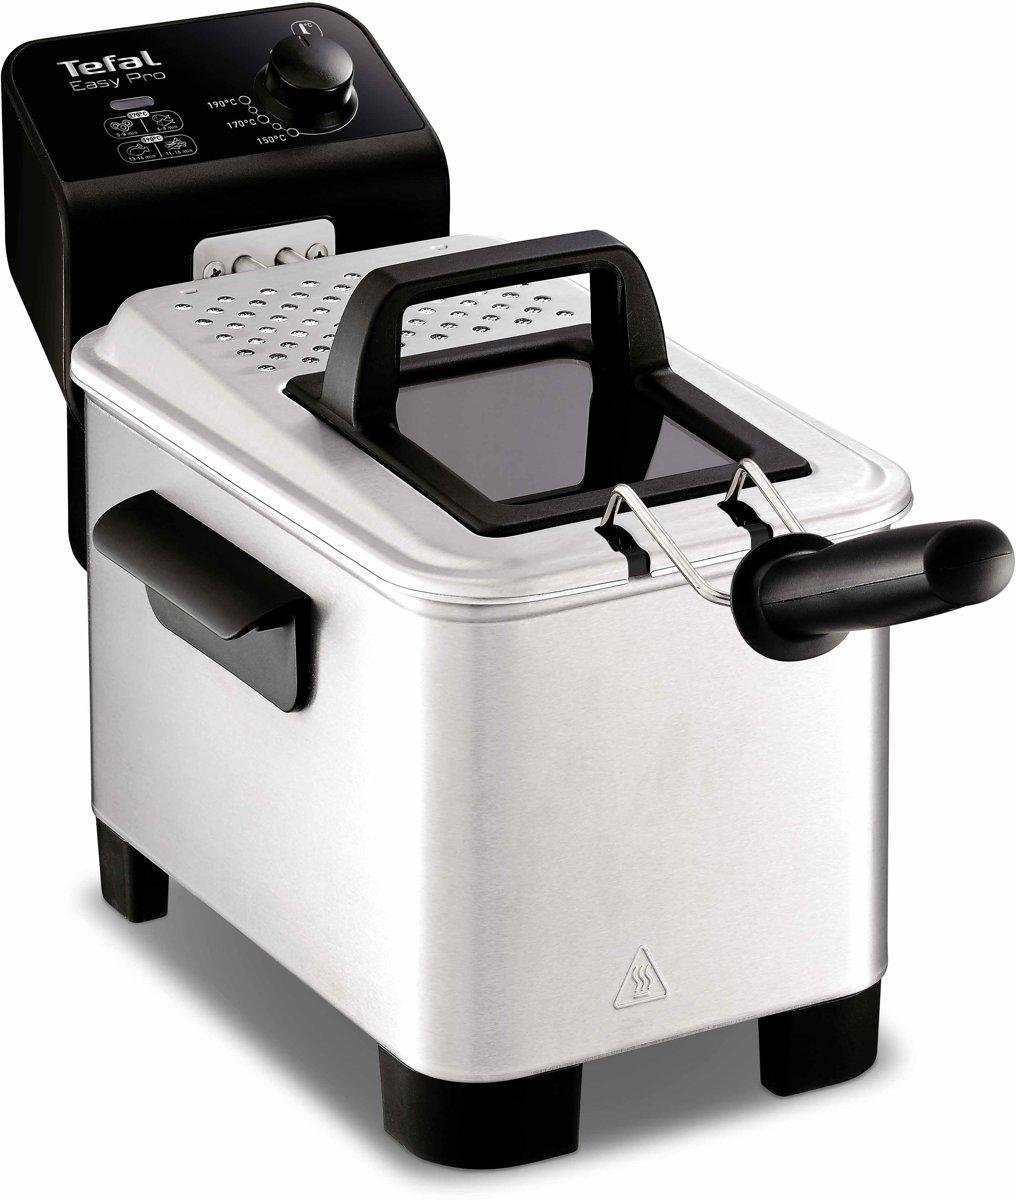 Tefal Easy Pro FR3330 - Frituurpan